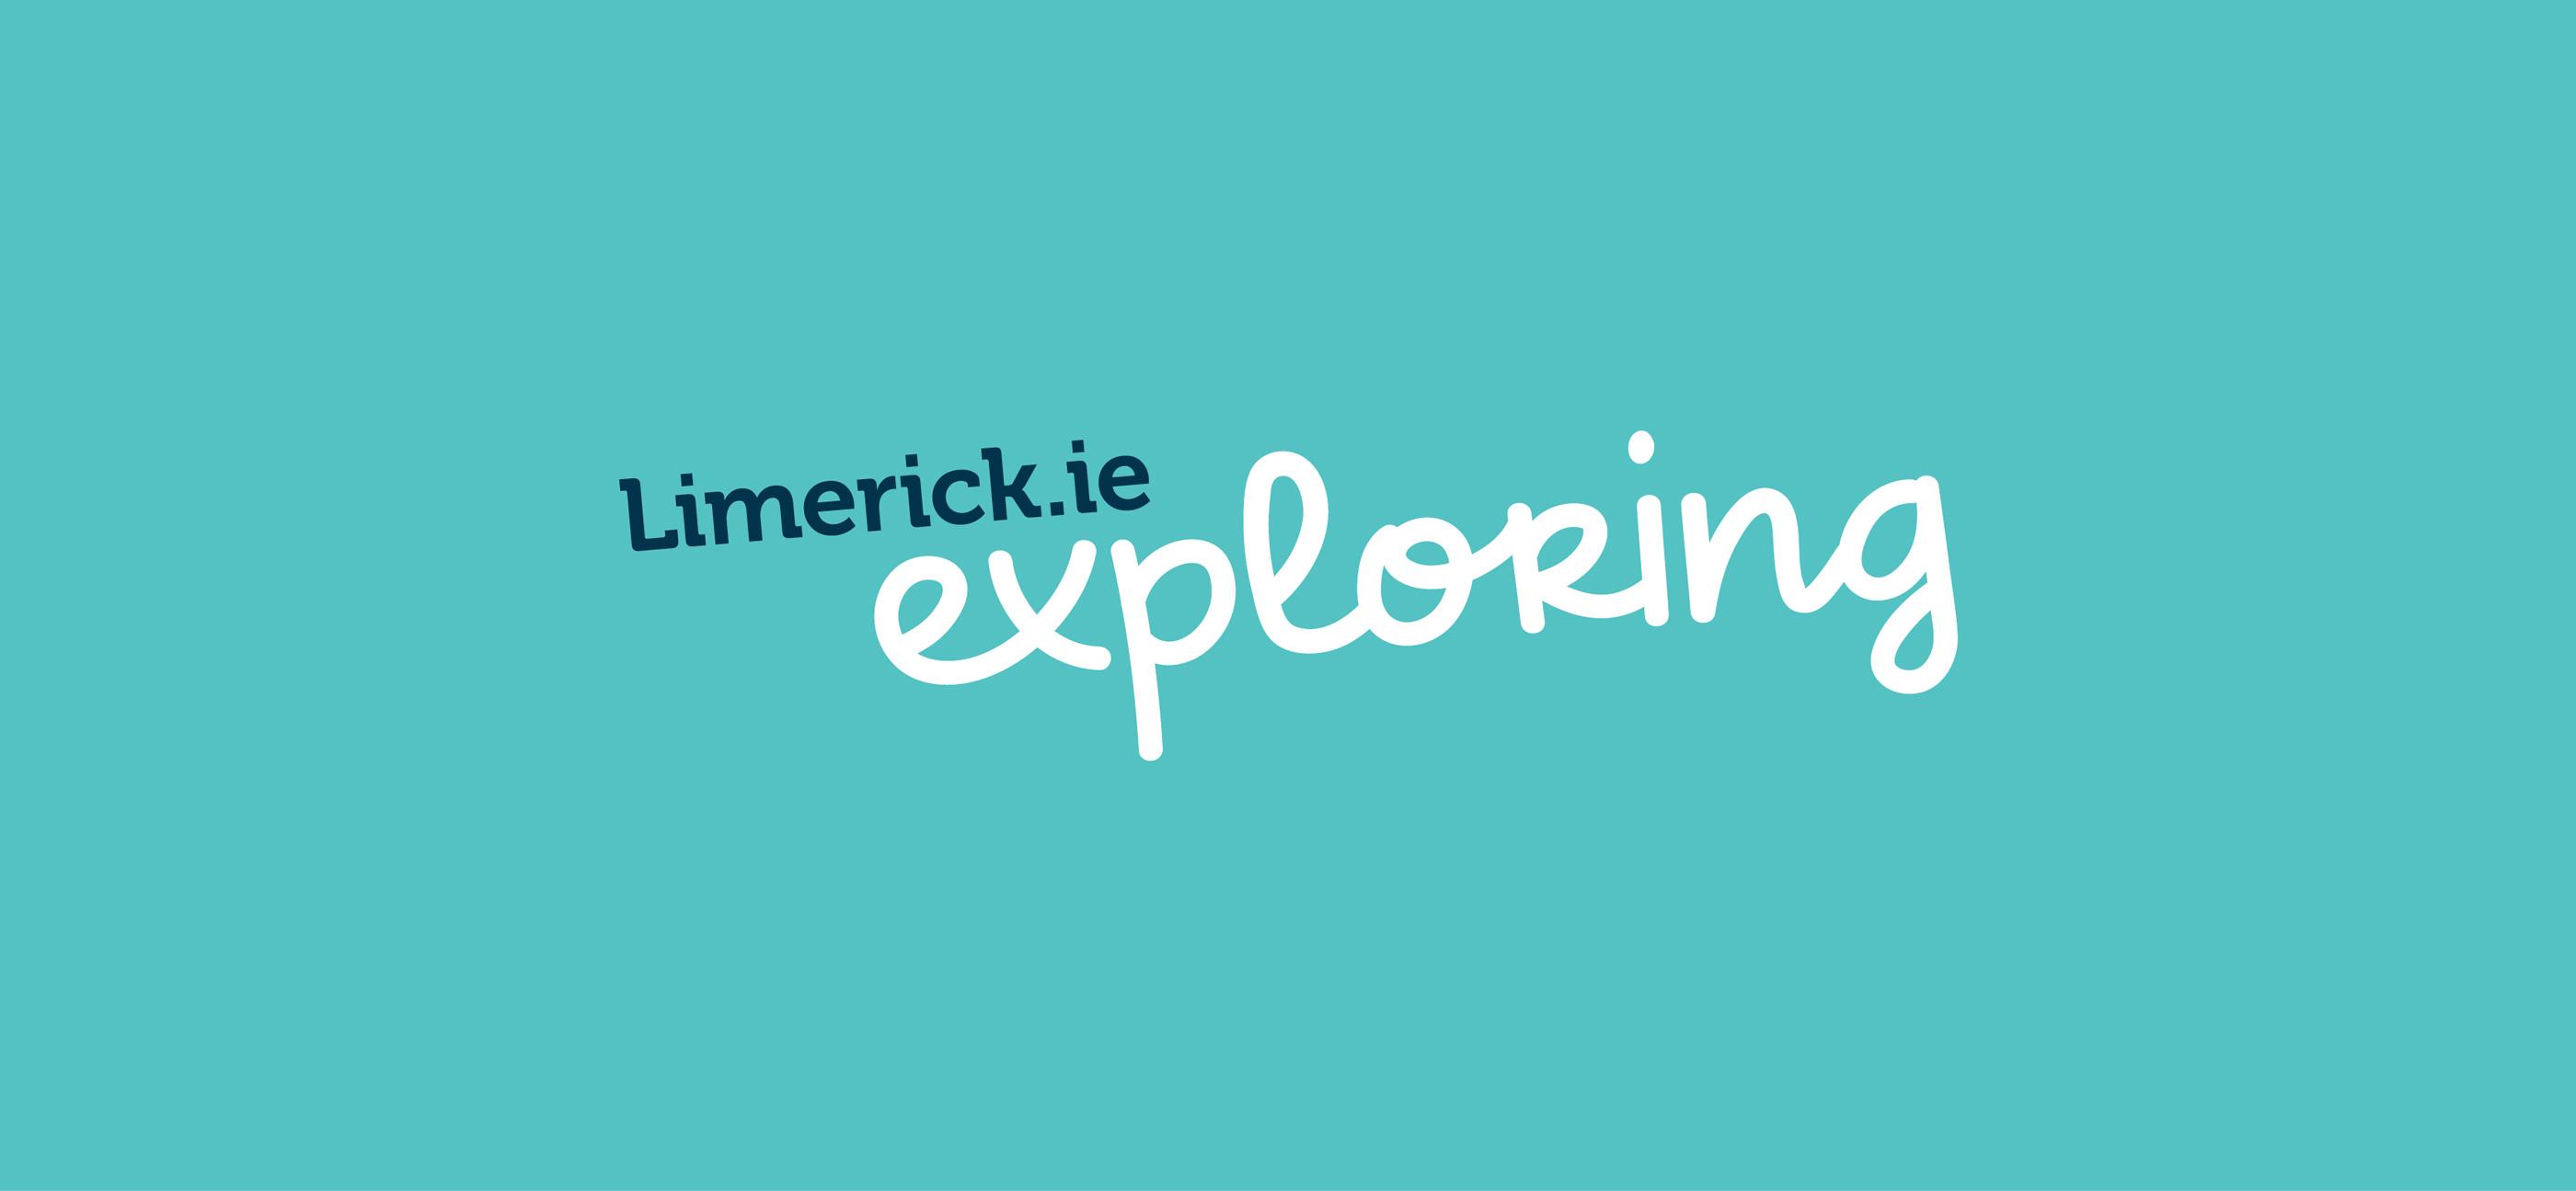 Limerick.ie Marketing Campaign Brand Identity